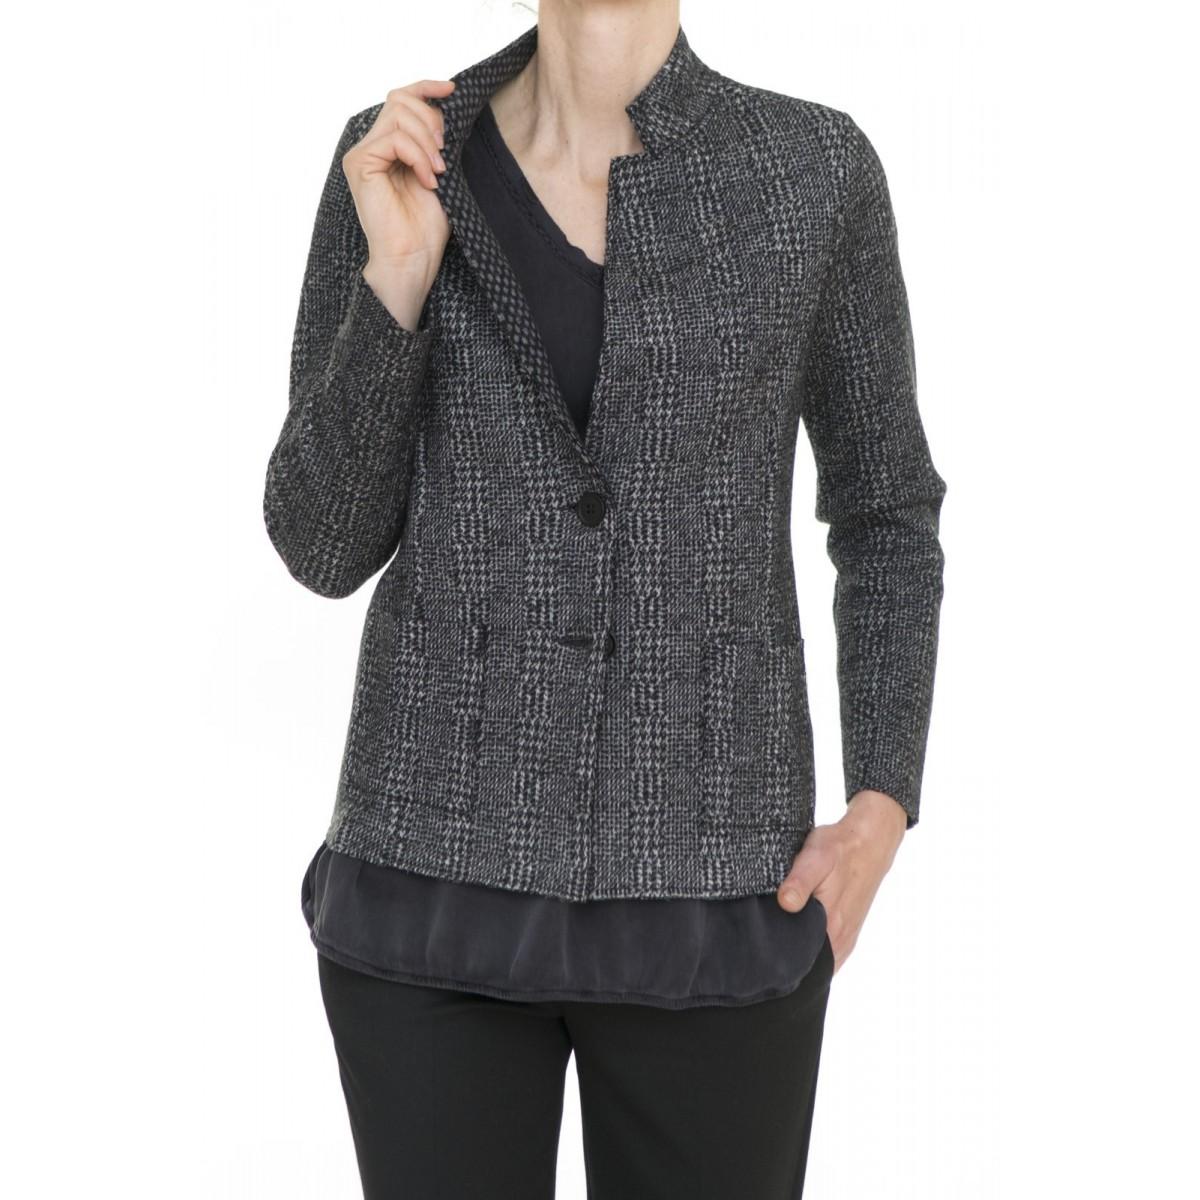 Giacca donna Kangra - 2510/57 giacca due bottoni